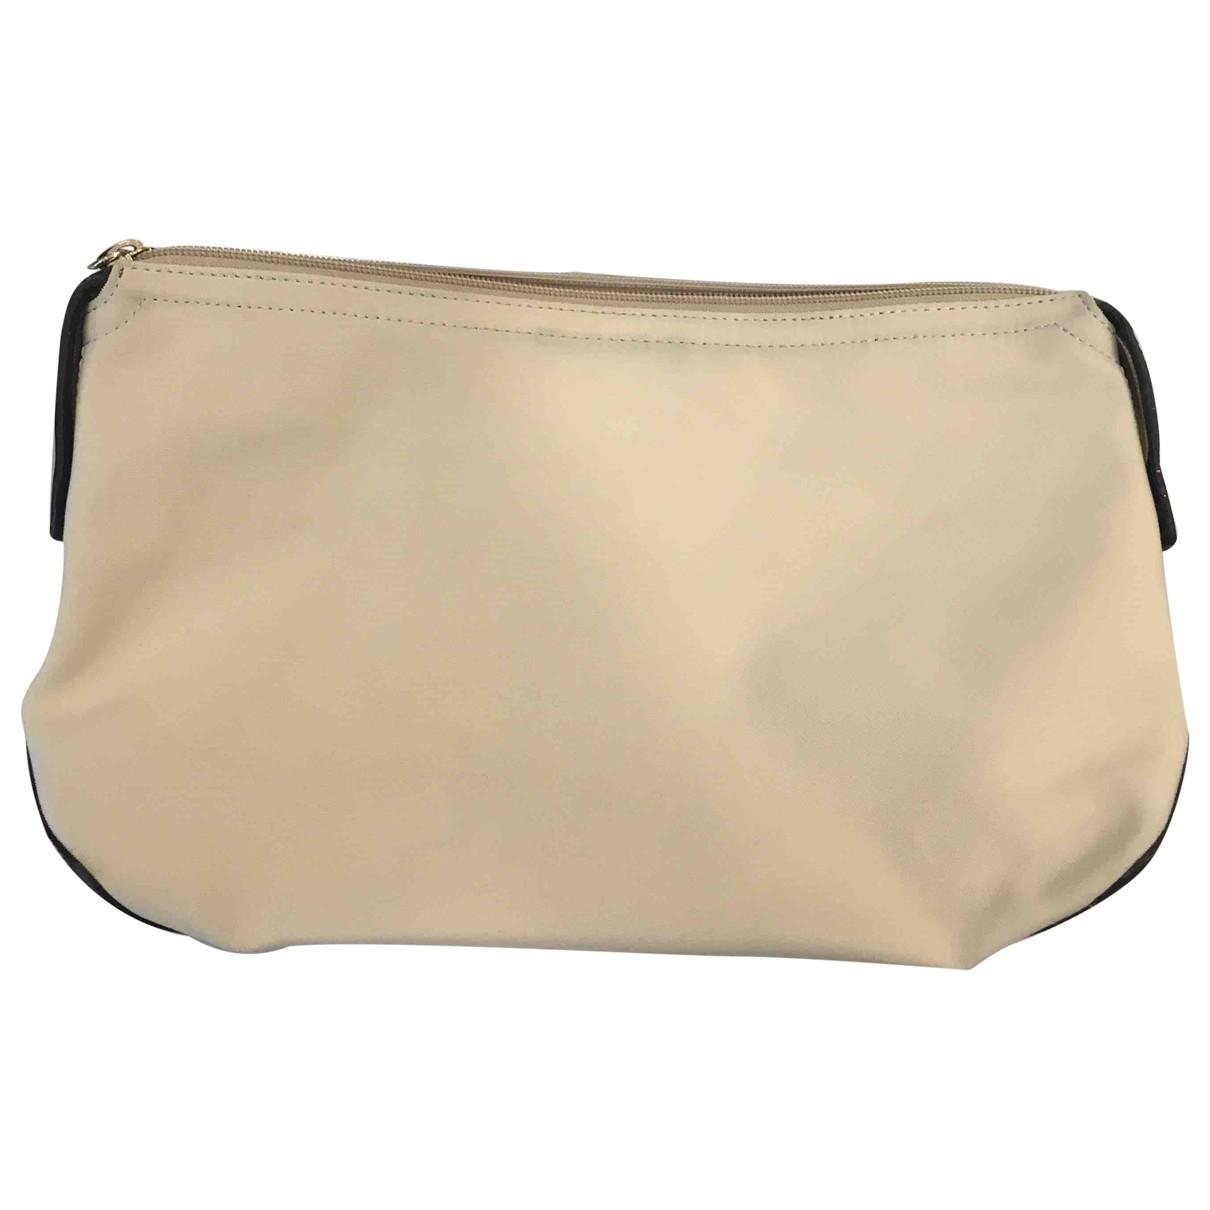 Loewe \N Beige Cloth Clutch bag for Women \N